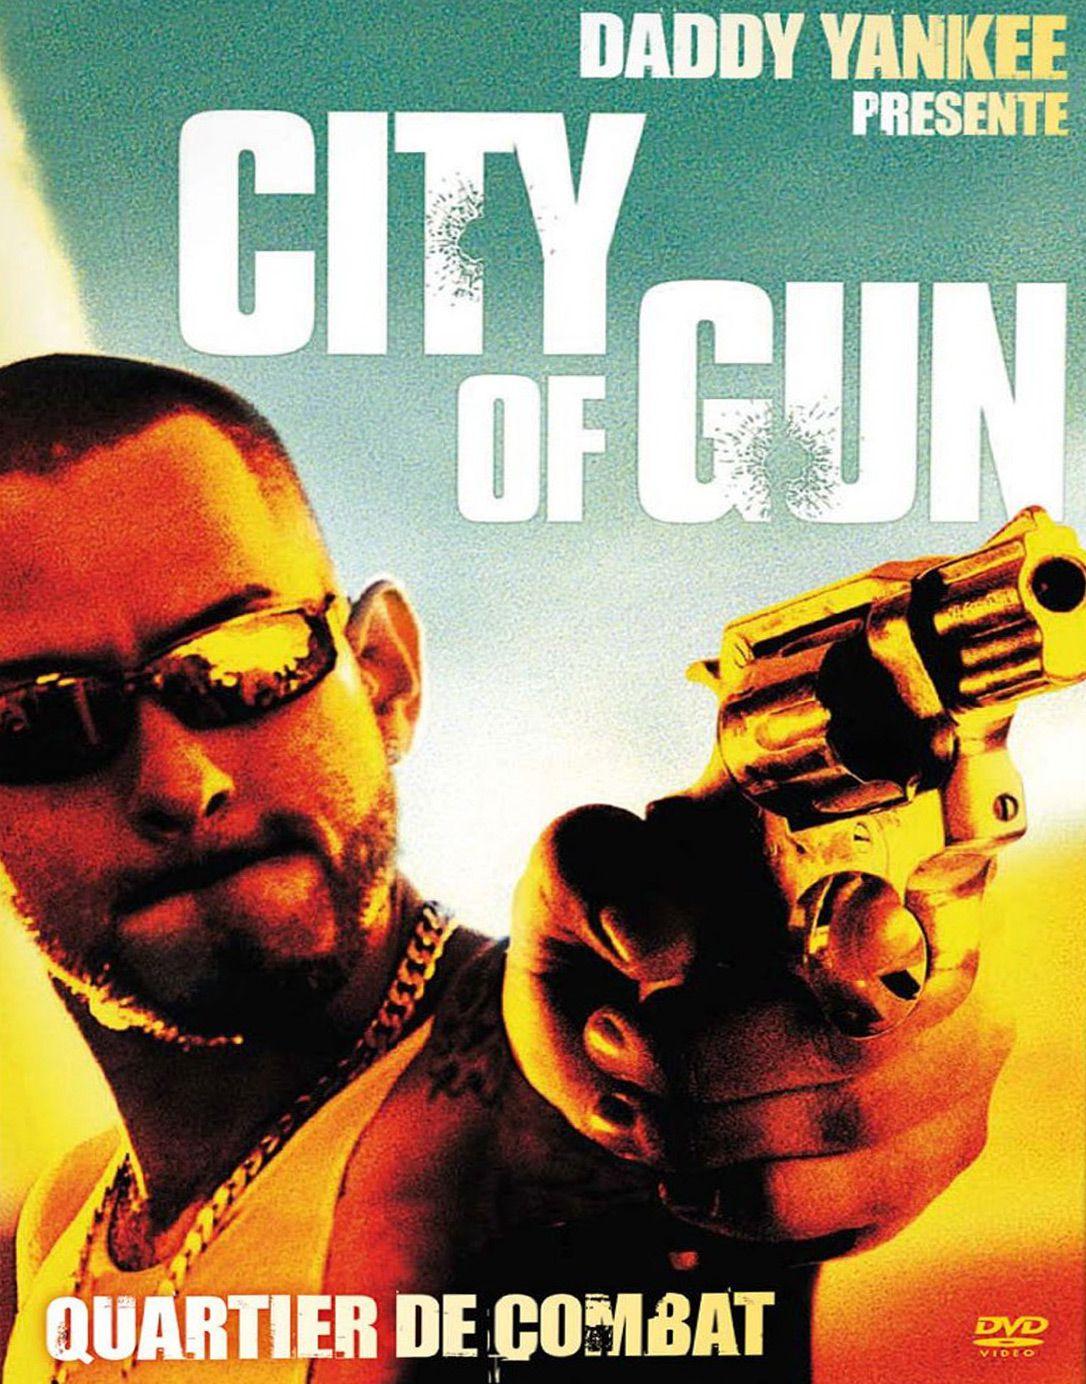 Quartier de combat - Film (2008)